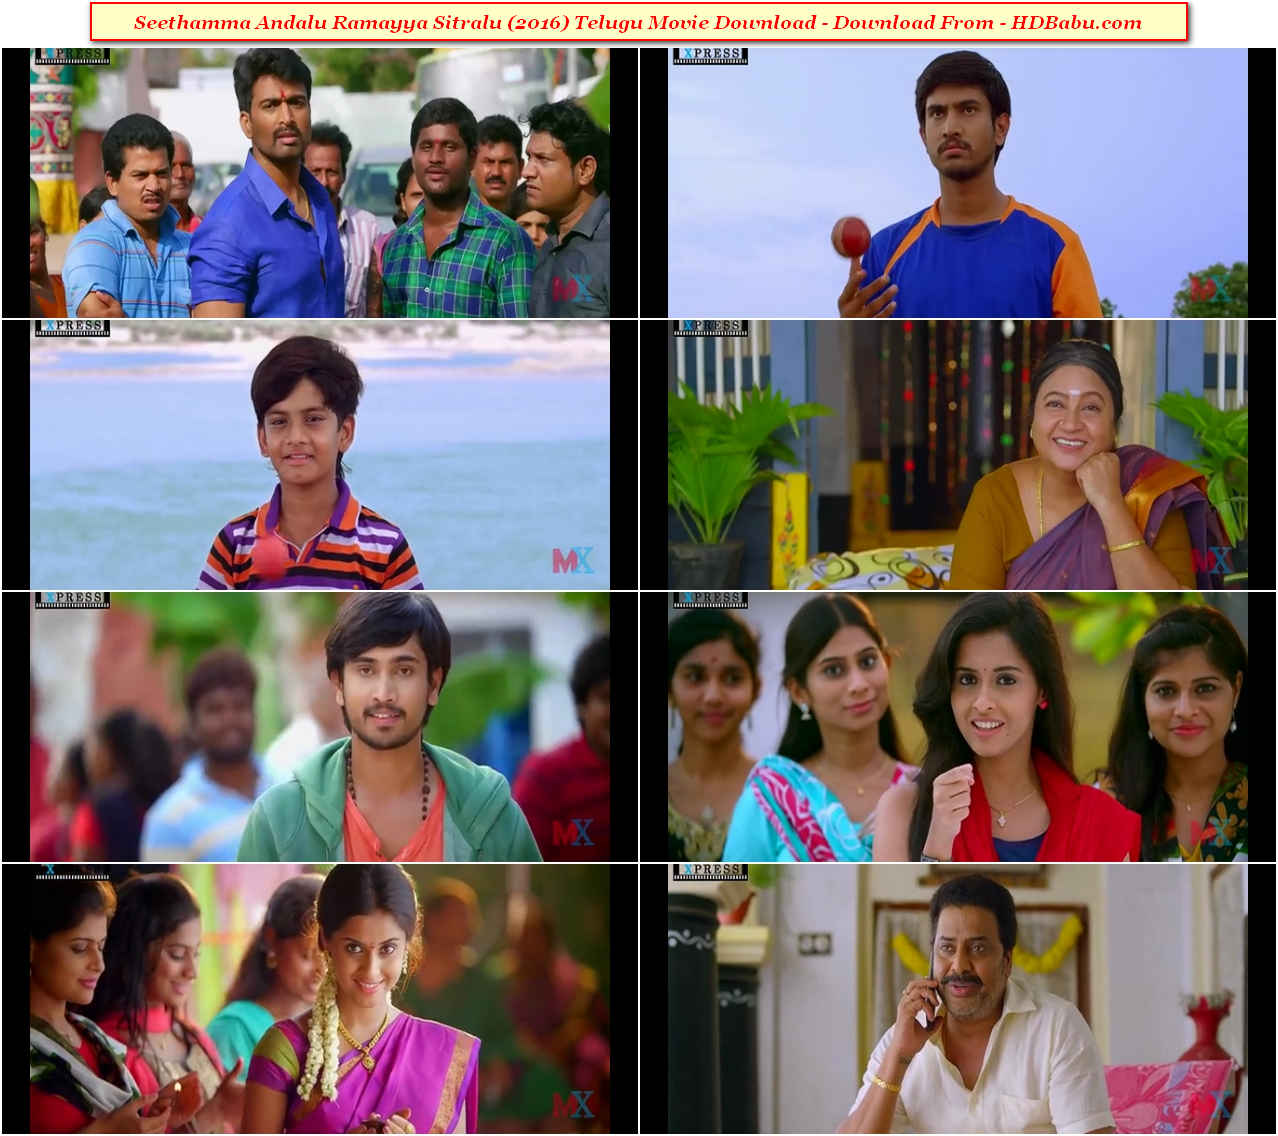 Seethamma Andalu Ramayya Sitralu Telugu Full Movie Download 720p Full HD Direct Download Links